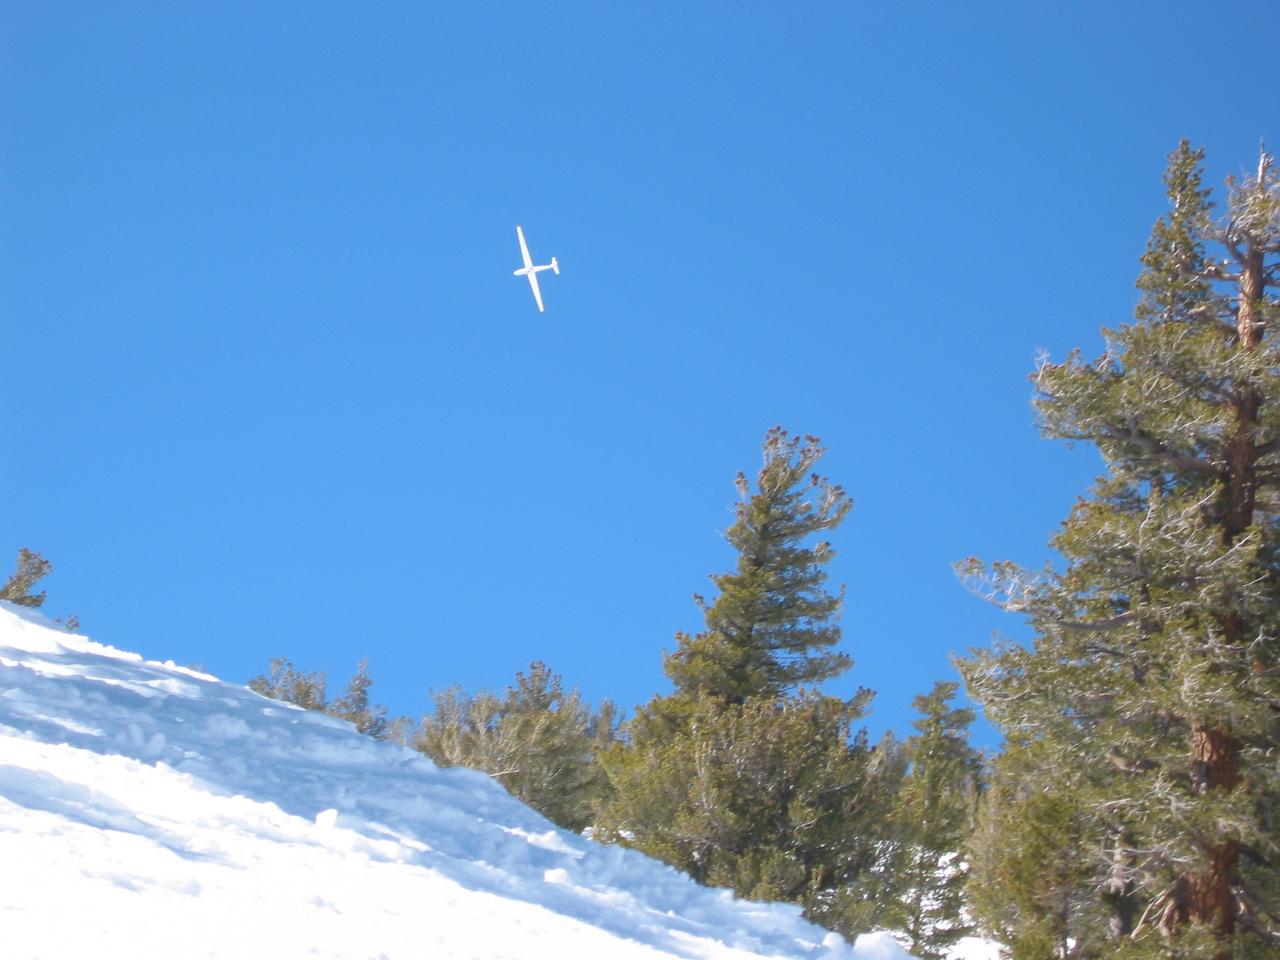 Glider, crashing. Well ok, maybe not.